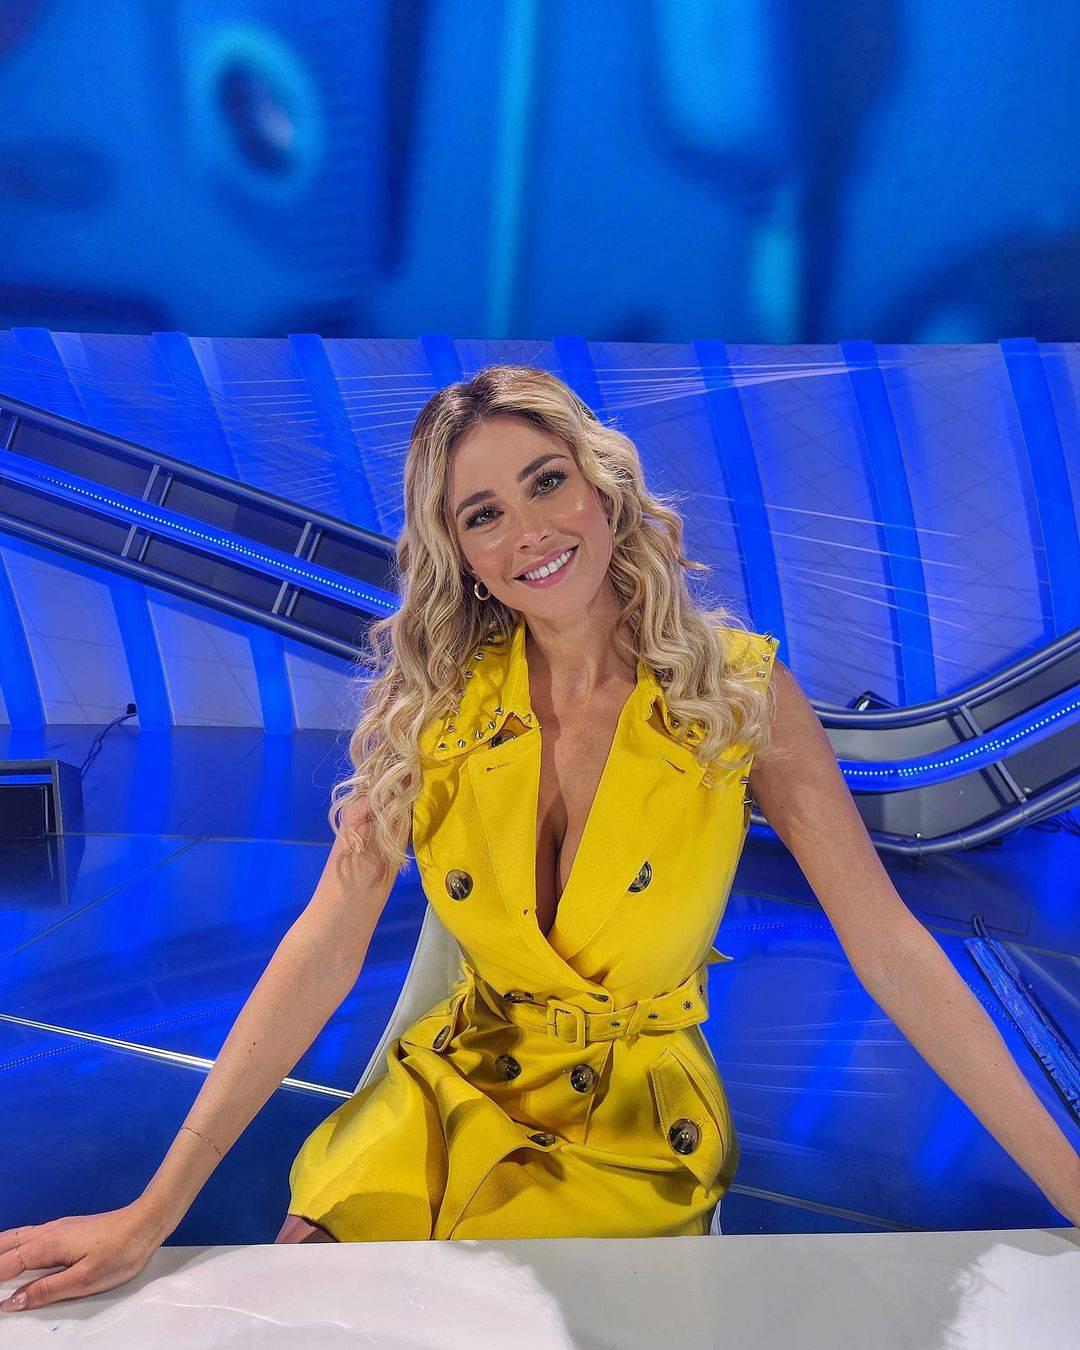 Diletta opet na poslu: Zasjala u žutoj haljini dubokog proreza